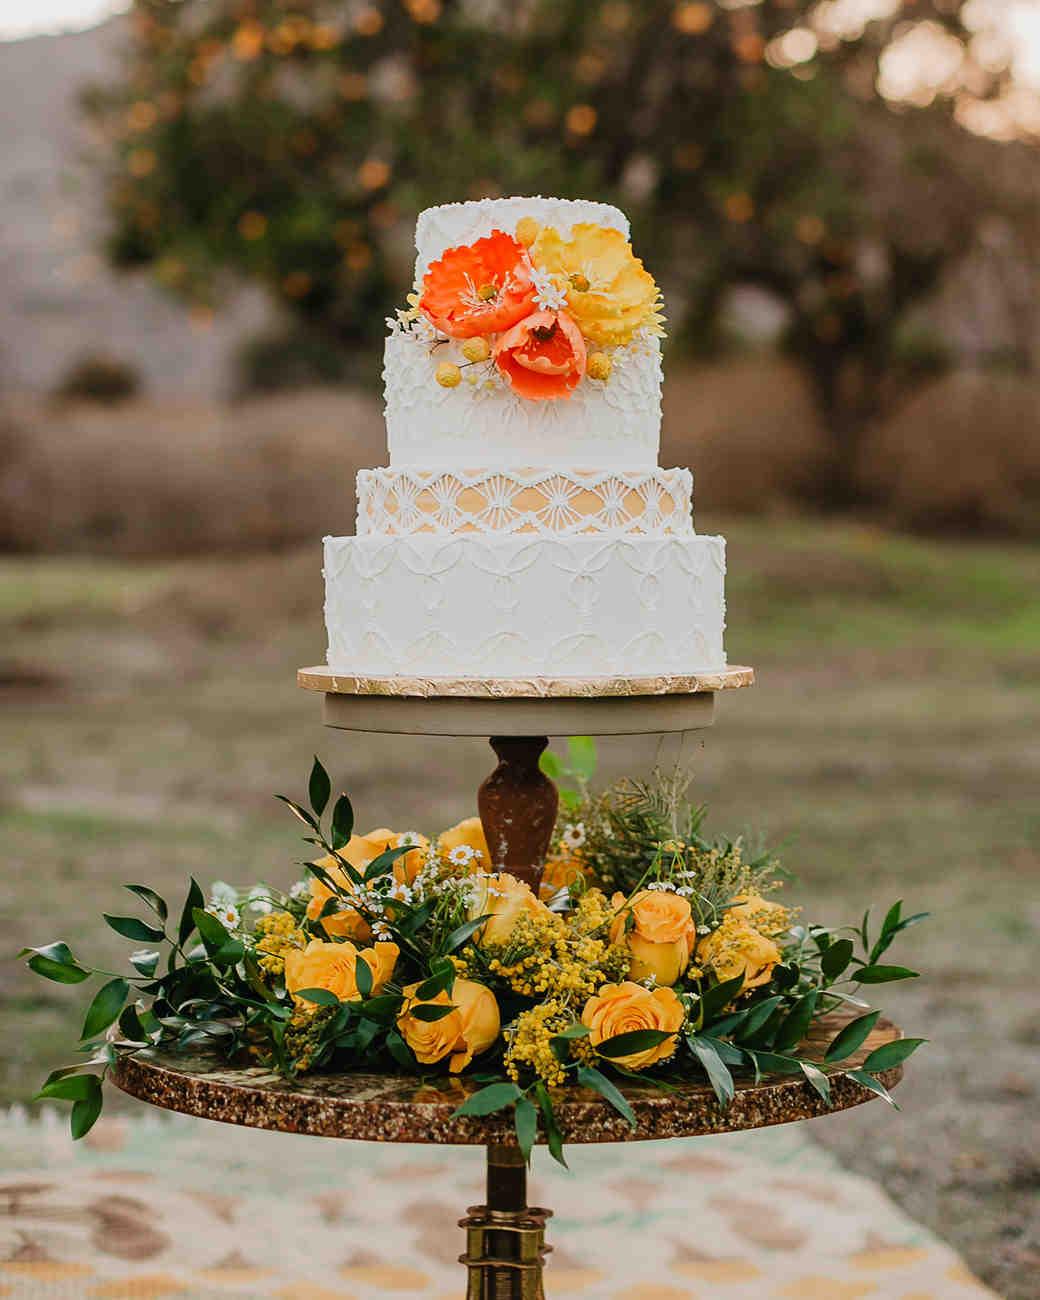 micro tier wedding cakes accent tier orange and white